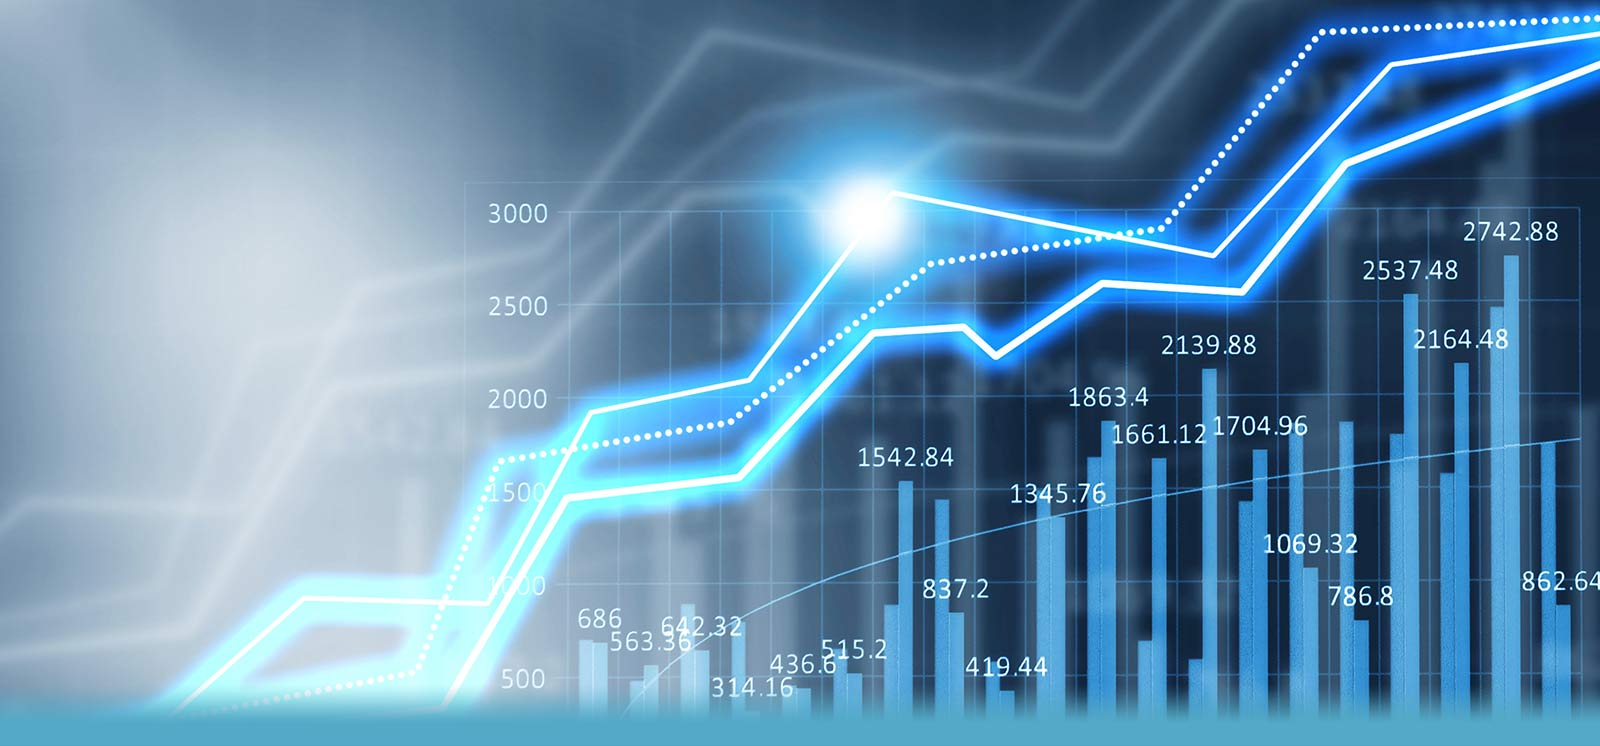 Share Market graphic